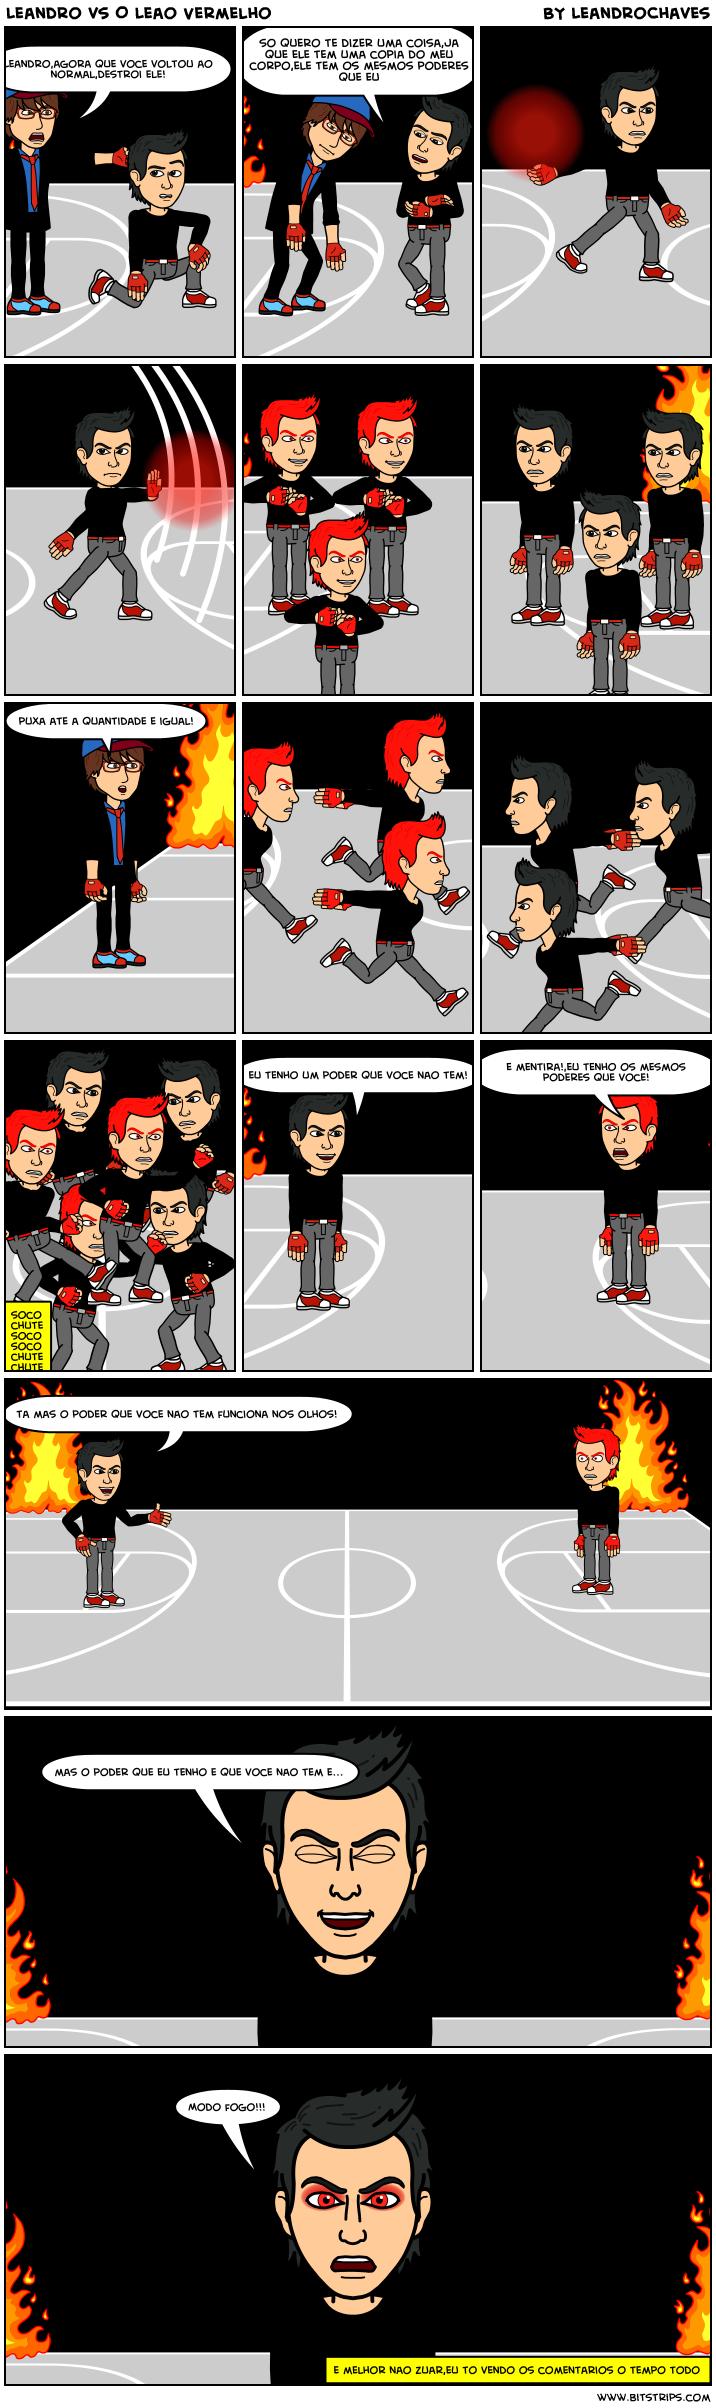 Leandro vs O Leao Vermelho